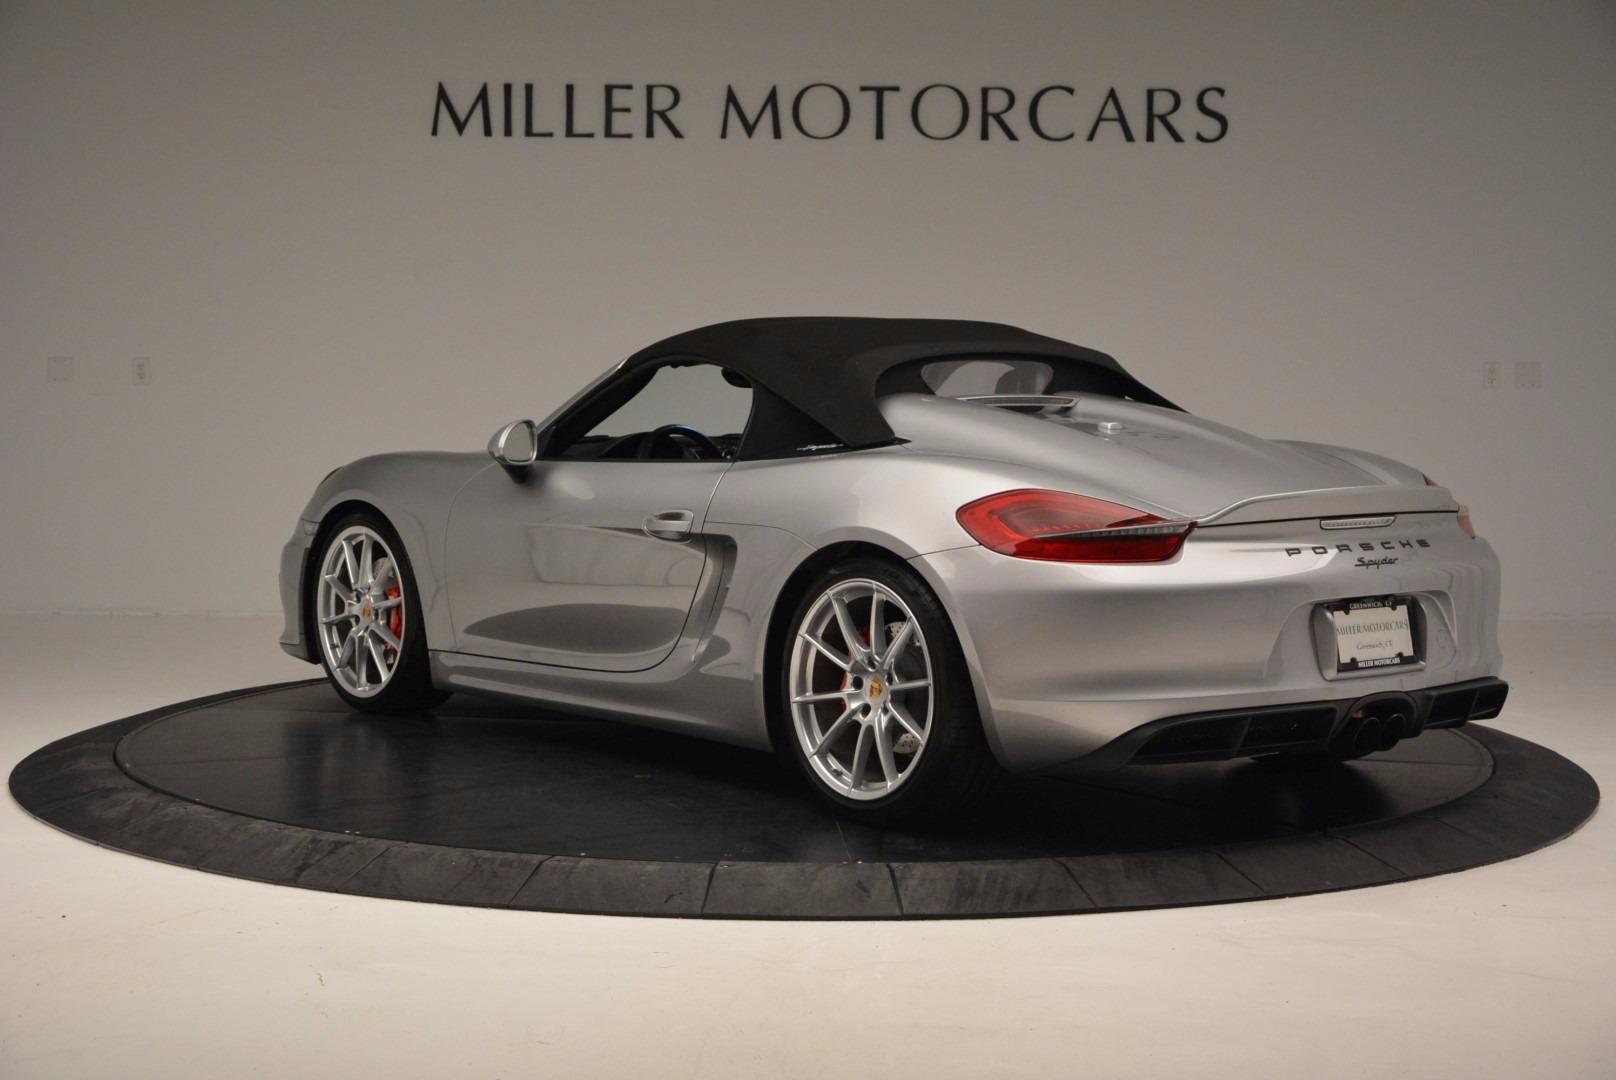 Used 2016 Porsche Boxster Spyder For Sale In Greenwich, CT. Alfa Romeo of Greenwich, 4307A 718_p15